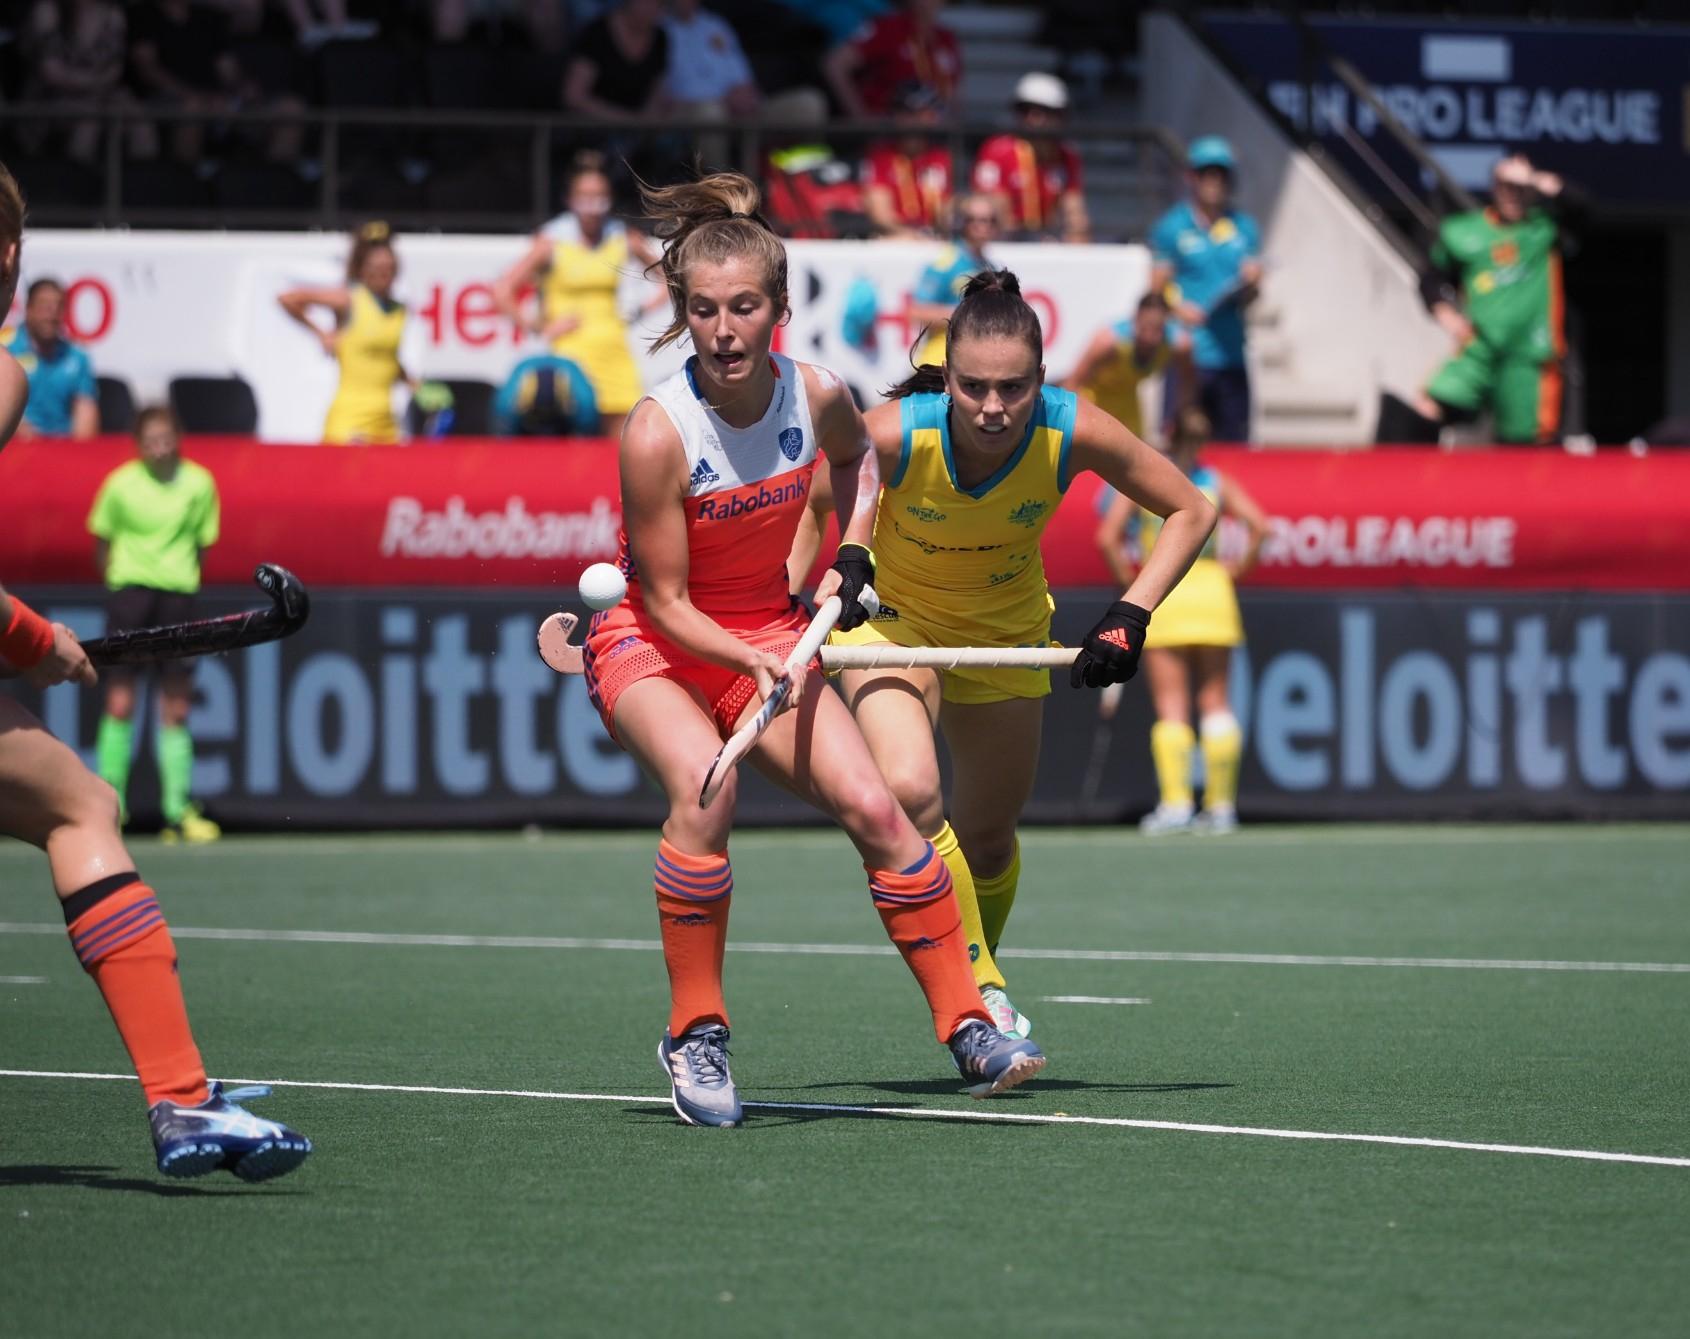 Round-up FIH Pro League (D): Oranjedames kennen tegen Australië uitstekende generale voor Grand Final